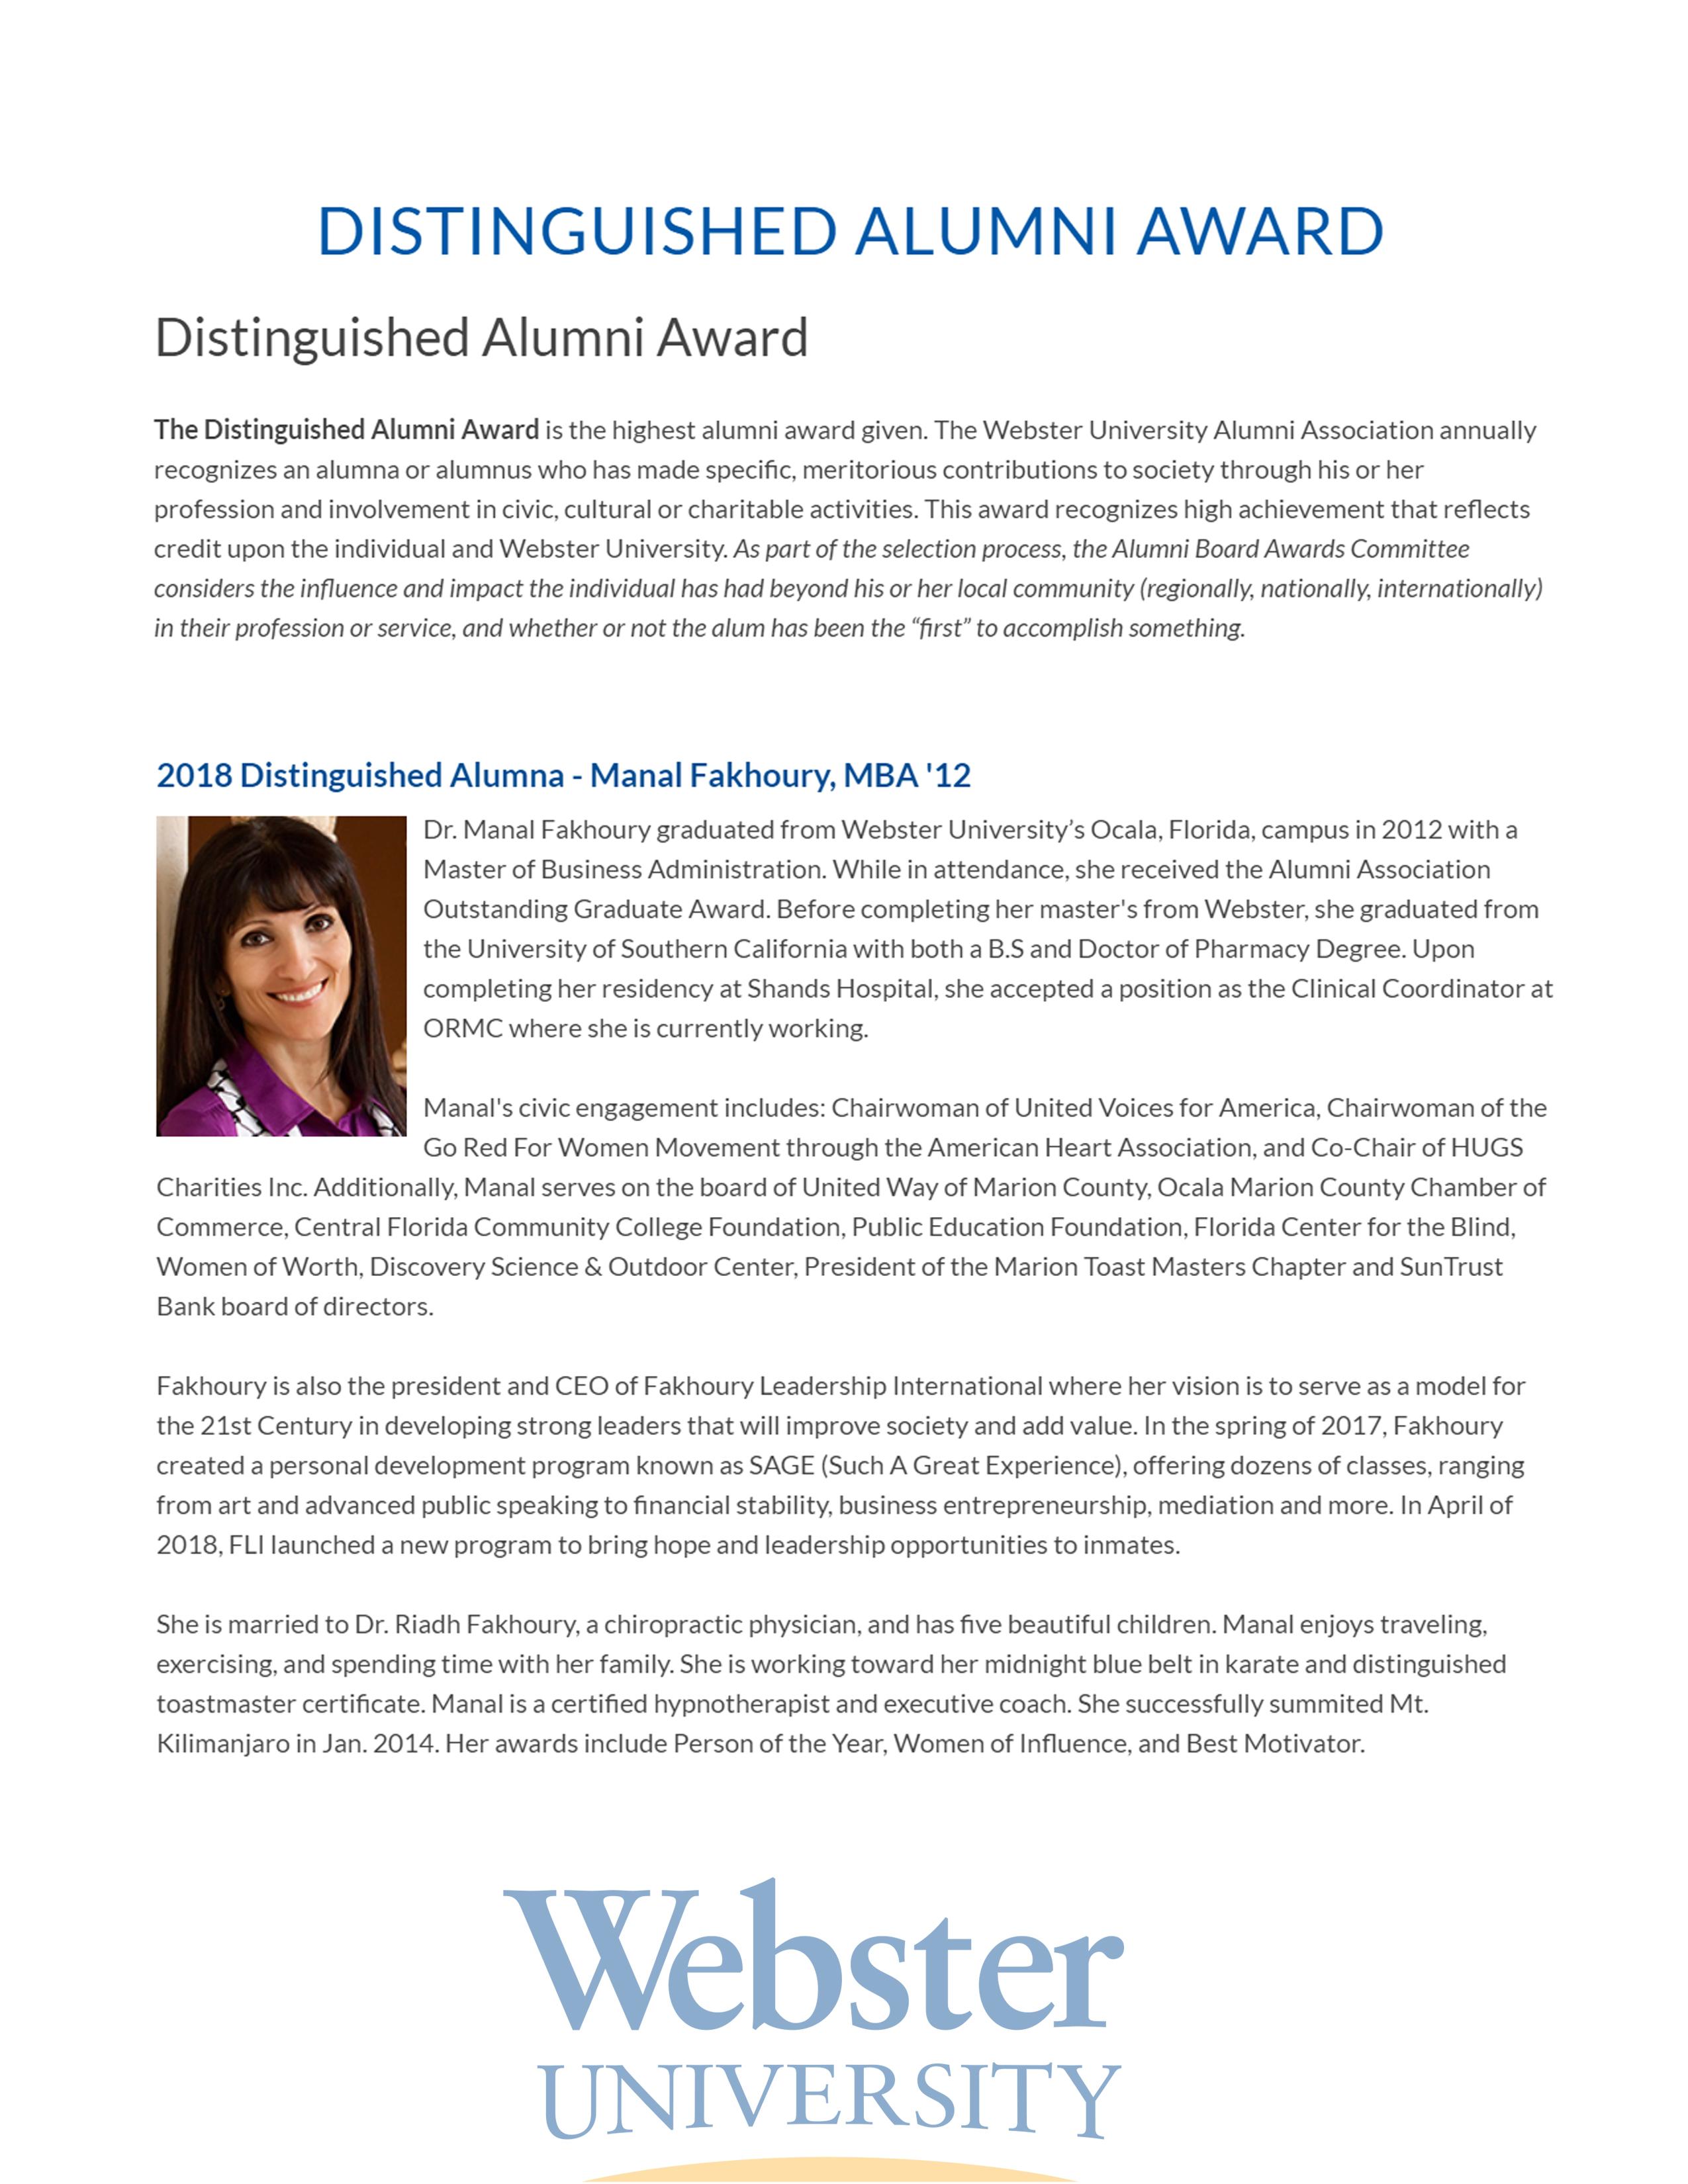 2018 Distinguished Alumna - Manal Fakhou